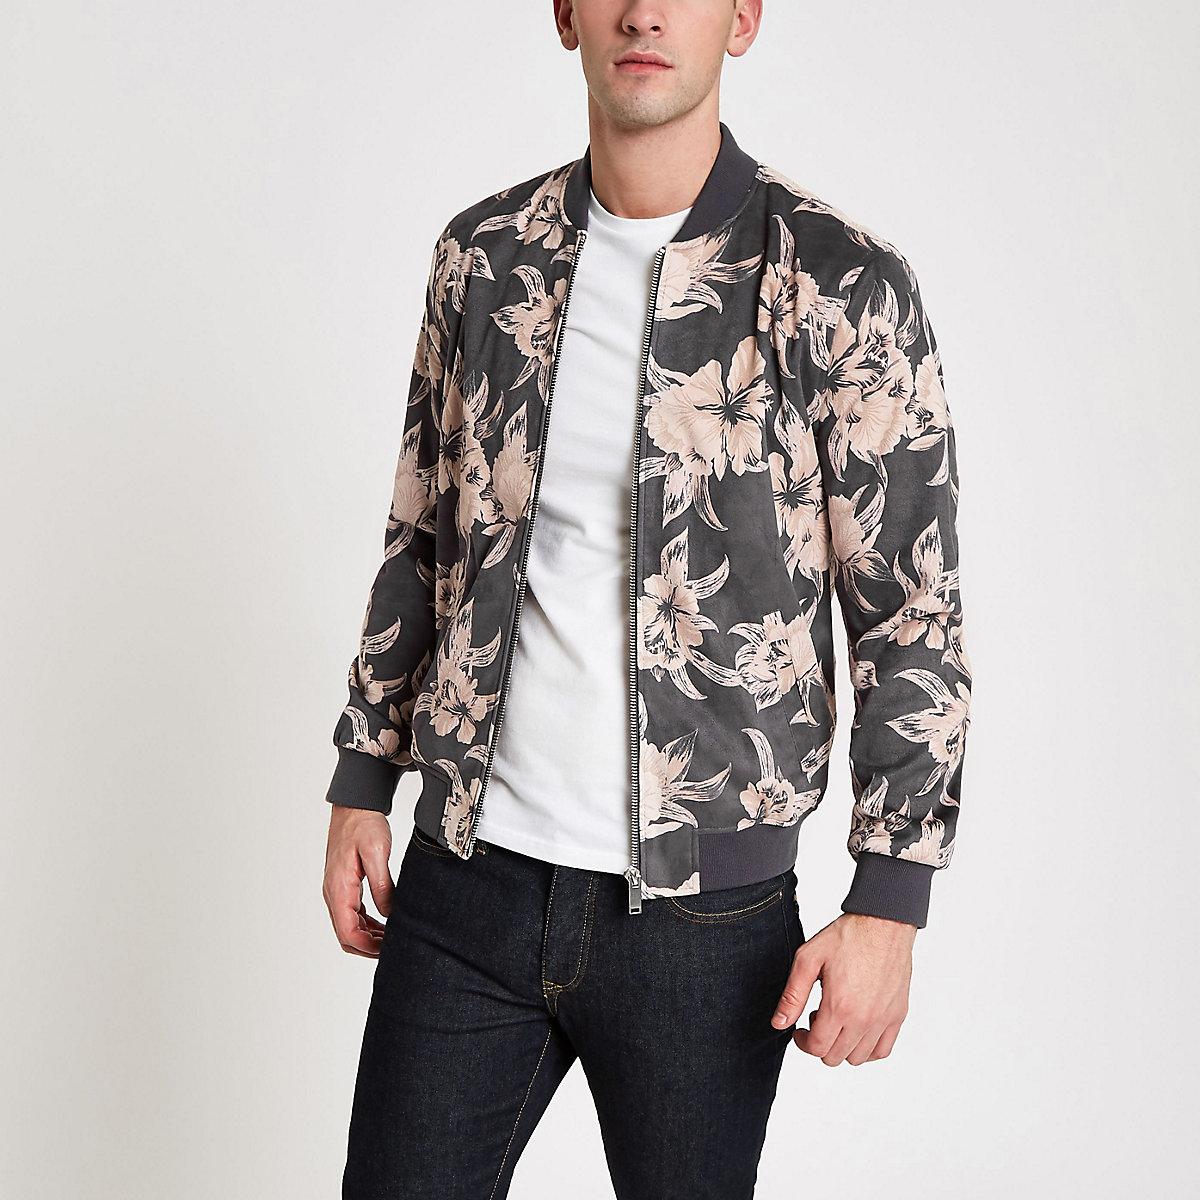 34c5ad7a5712 Grey floral faux suede bomber jacket - Jackets - Coats   Jackets - men